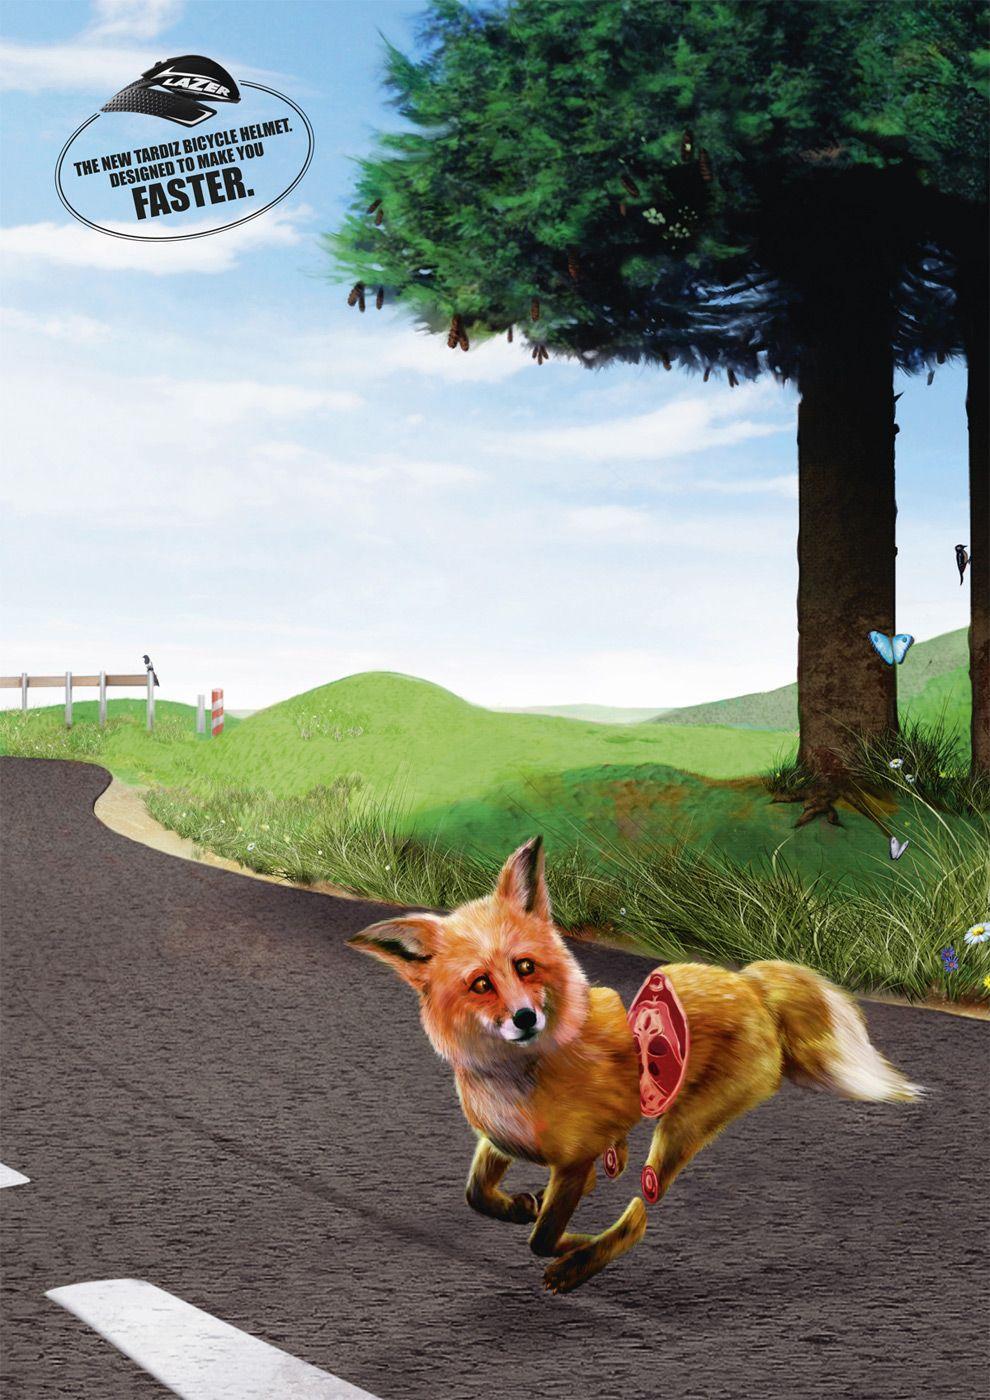 Lazer bicycle helmets: Fox